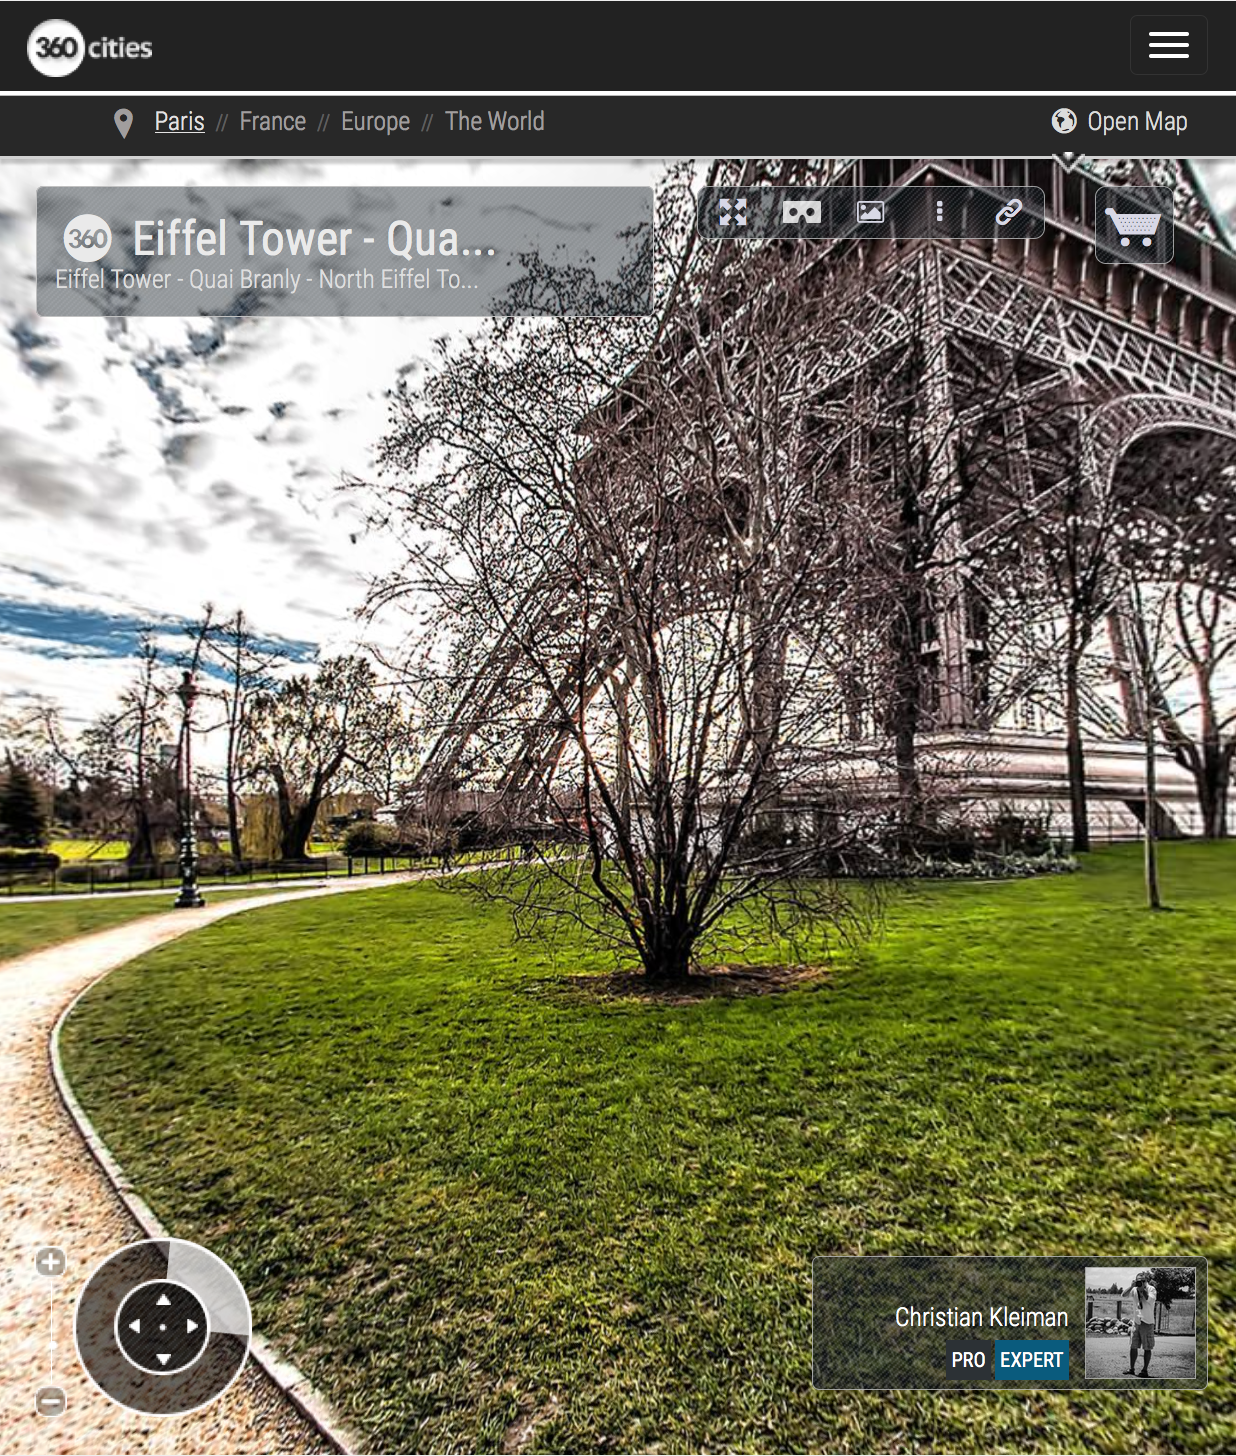 Eiffel Tower Paris - Quai Branly - North Eiffel Tower pillar - Creative 360 VR Panoramic Photography - Emblematic places in Paris by © Christian Kleiman